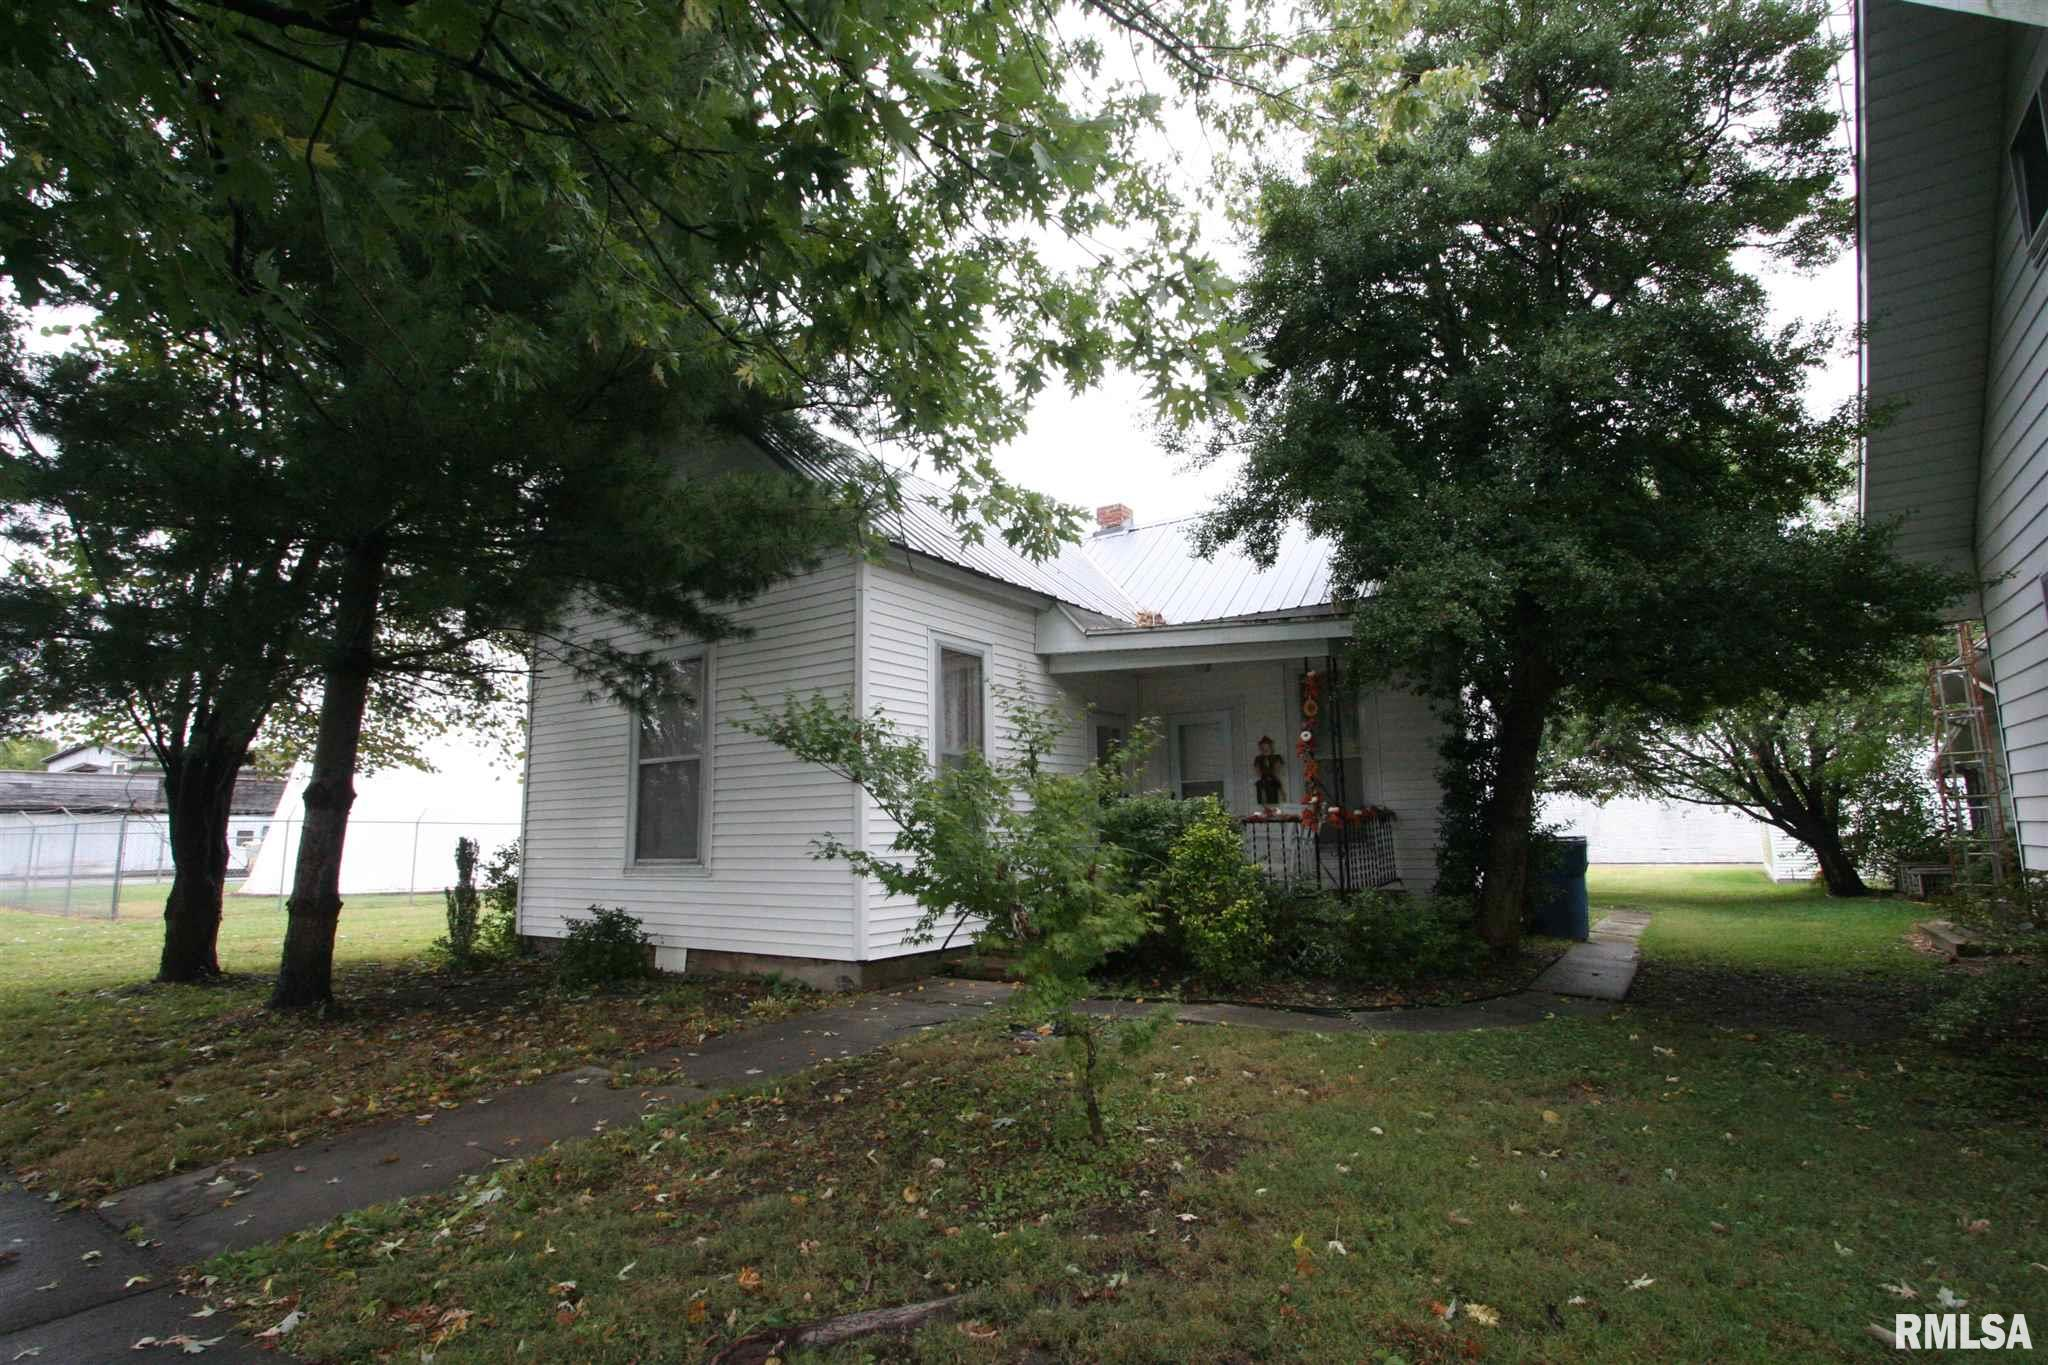 412 FIRST Property Photo - Carmi, IL real estate listing